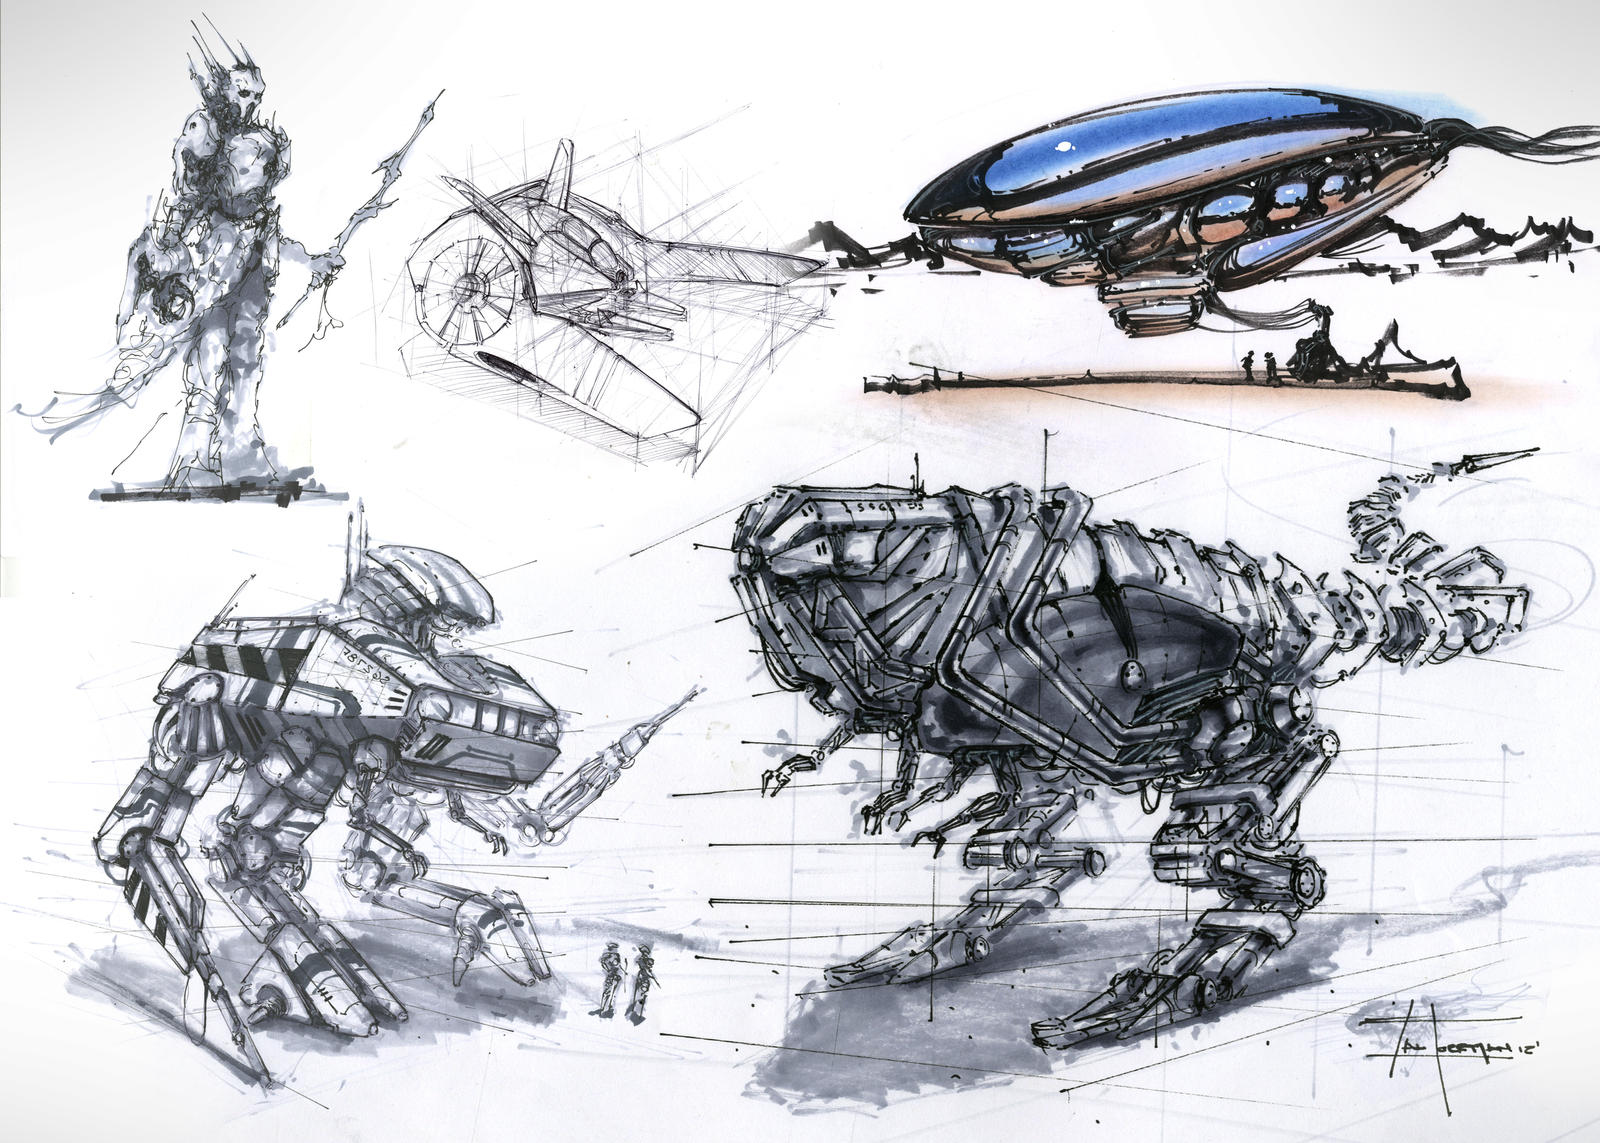 Big sketch dump by zakforeman